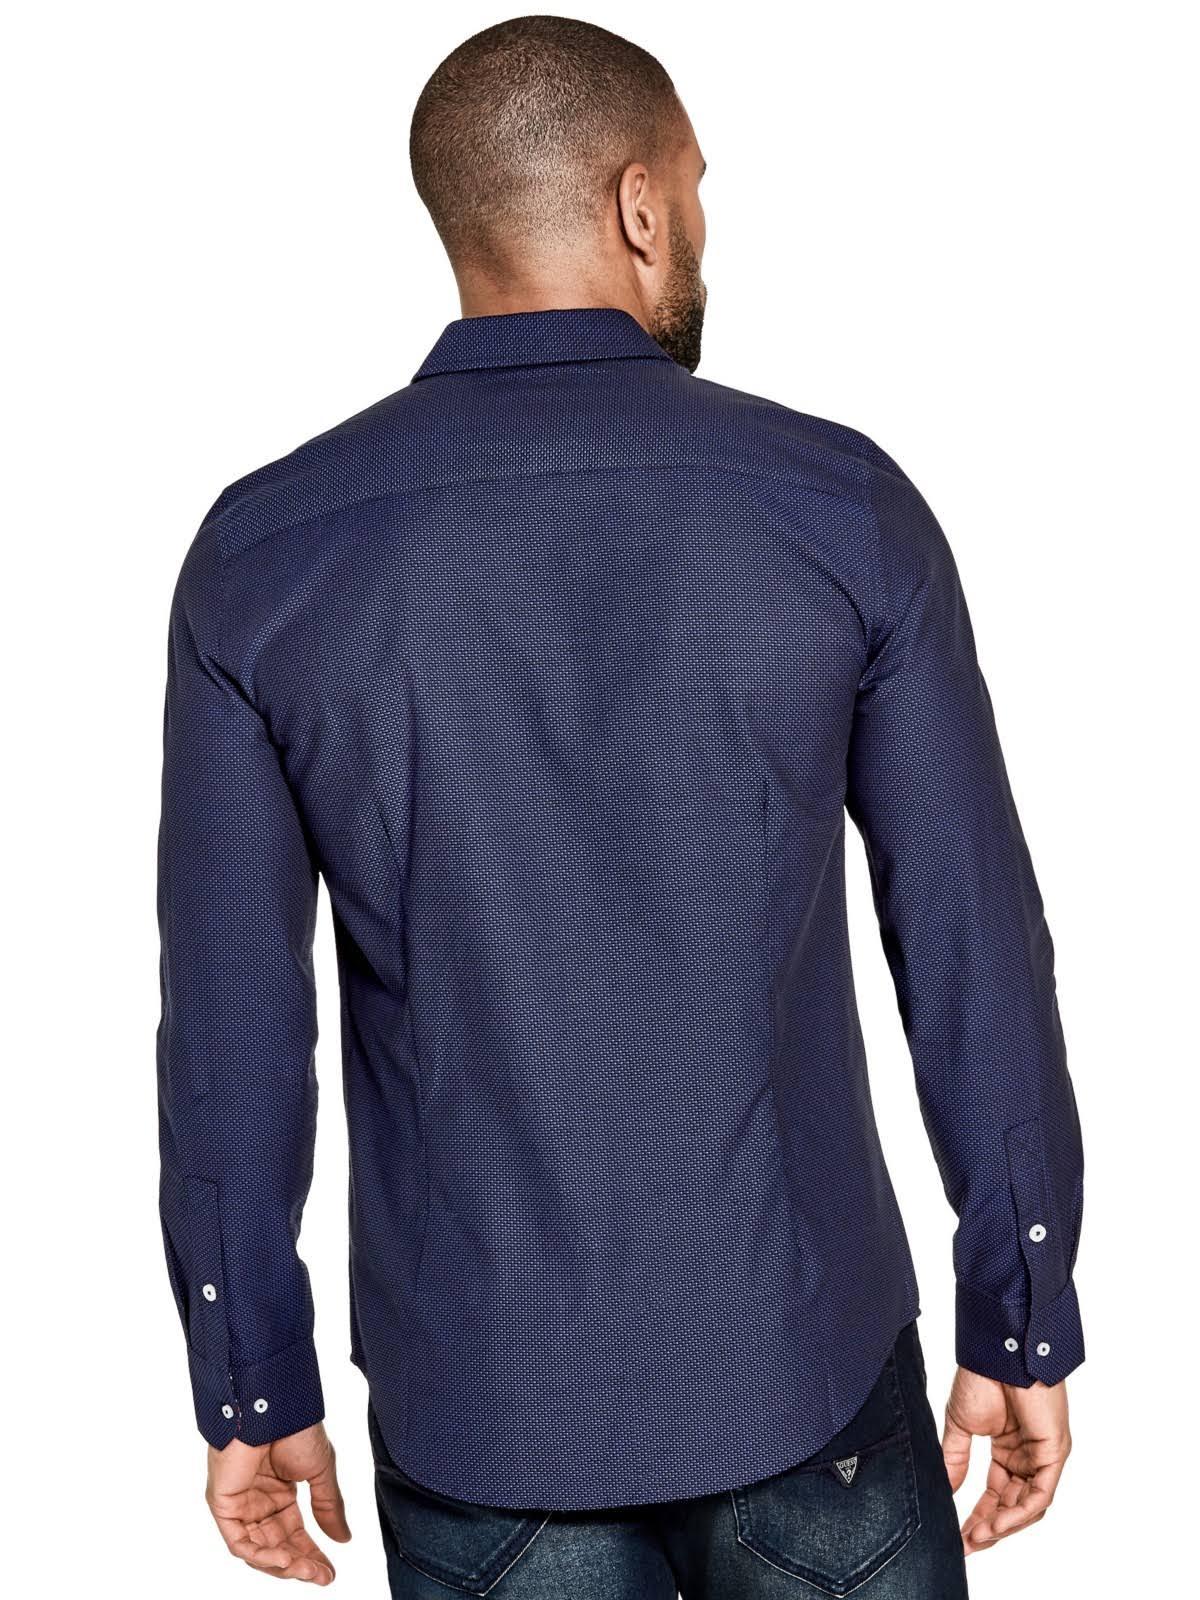 Chapman Botones Con Camisa Delantera En Guess Parte Azul La Nightfall Factory THqIgxE